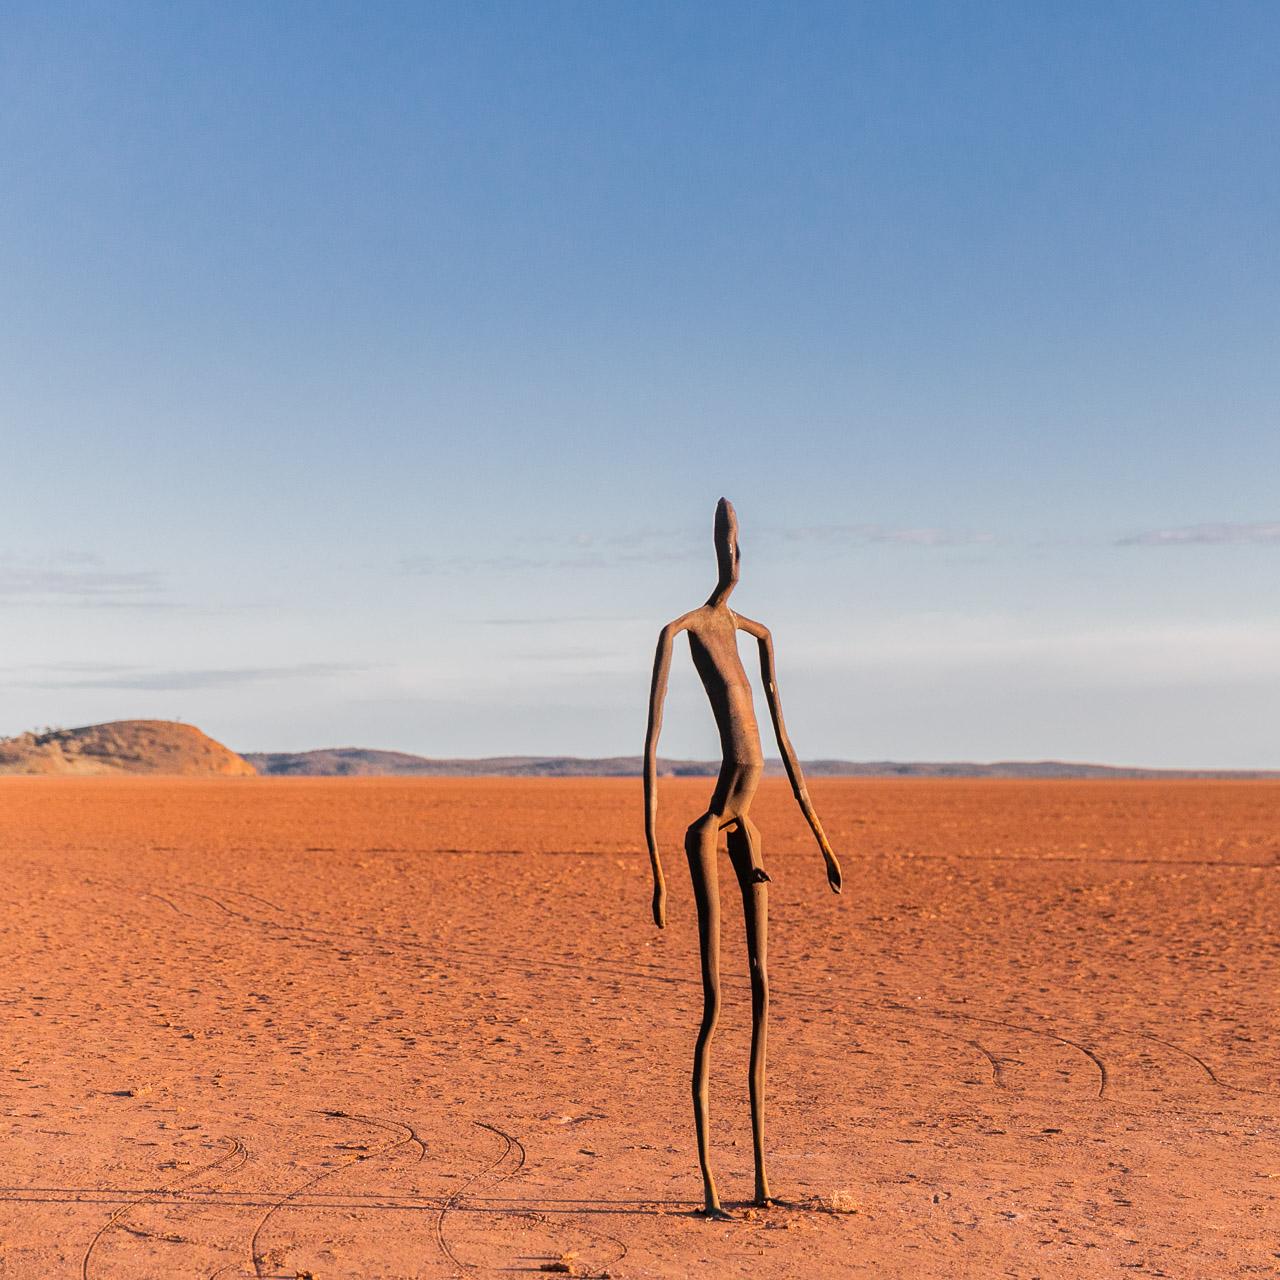 One of Antony Gormley's 51 sculptures on Lake Ballard in WA's Goldfields